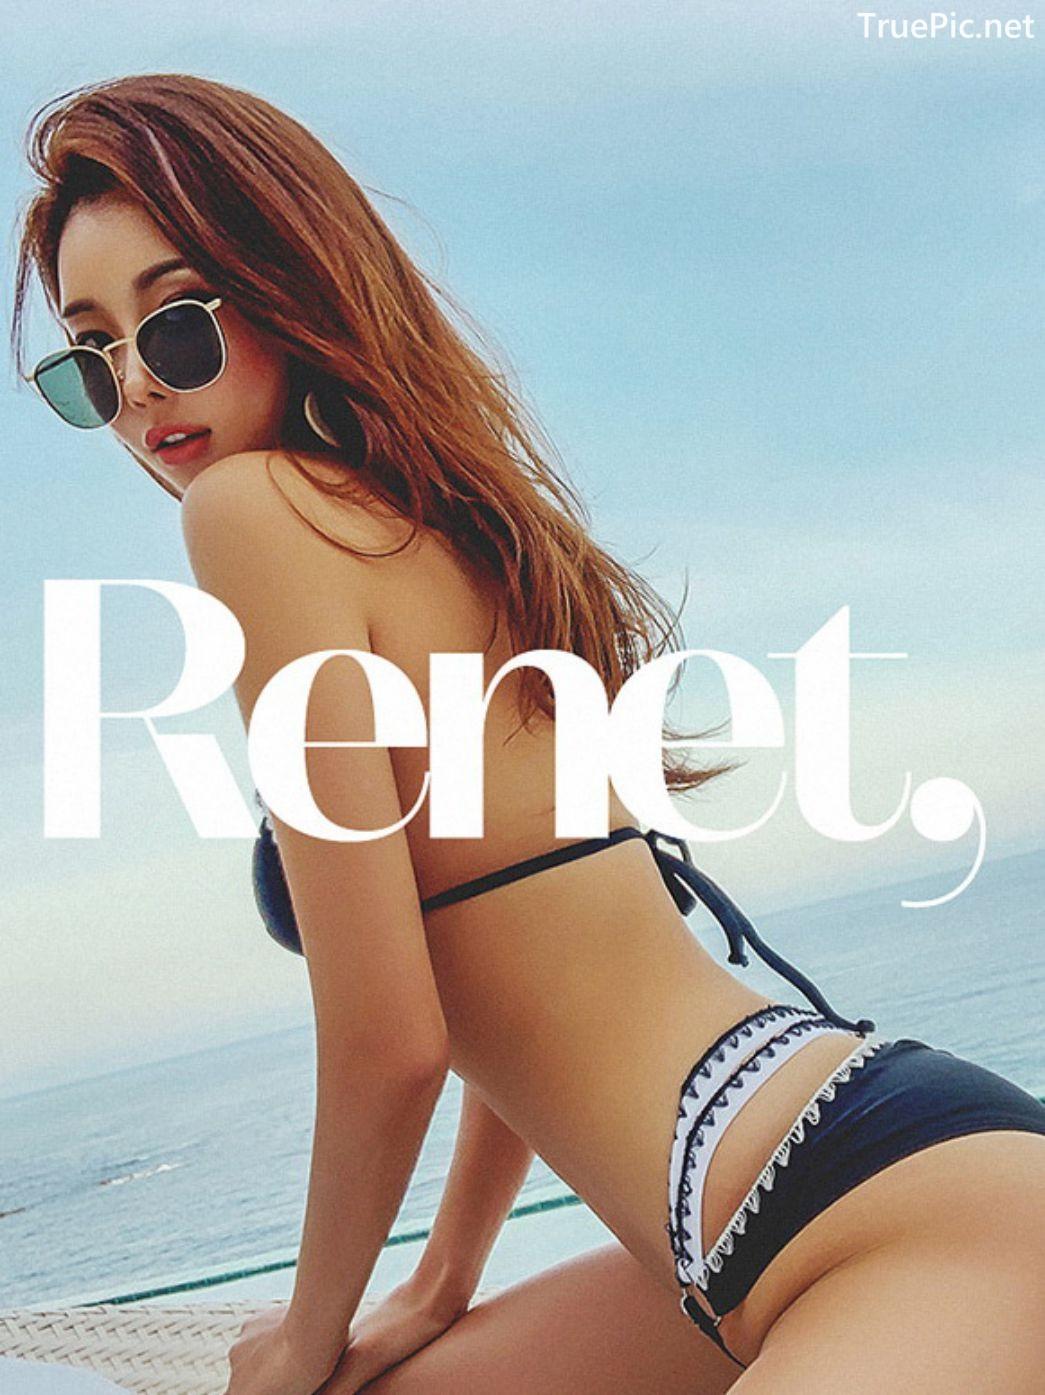 Image Korean Fashion Model - Park Da Hyun - Renet Bikini - TruePic.net - Picture-4